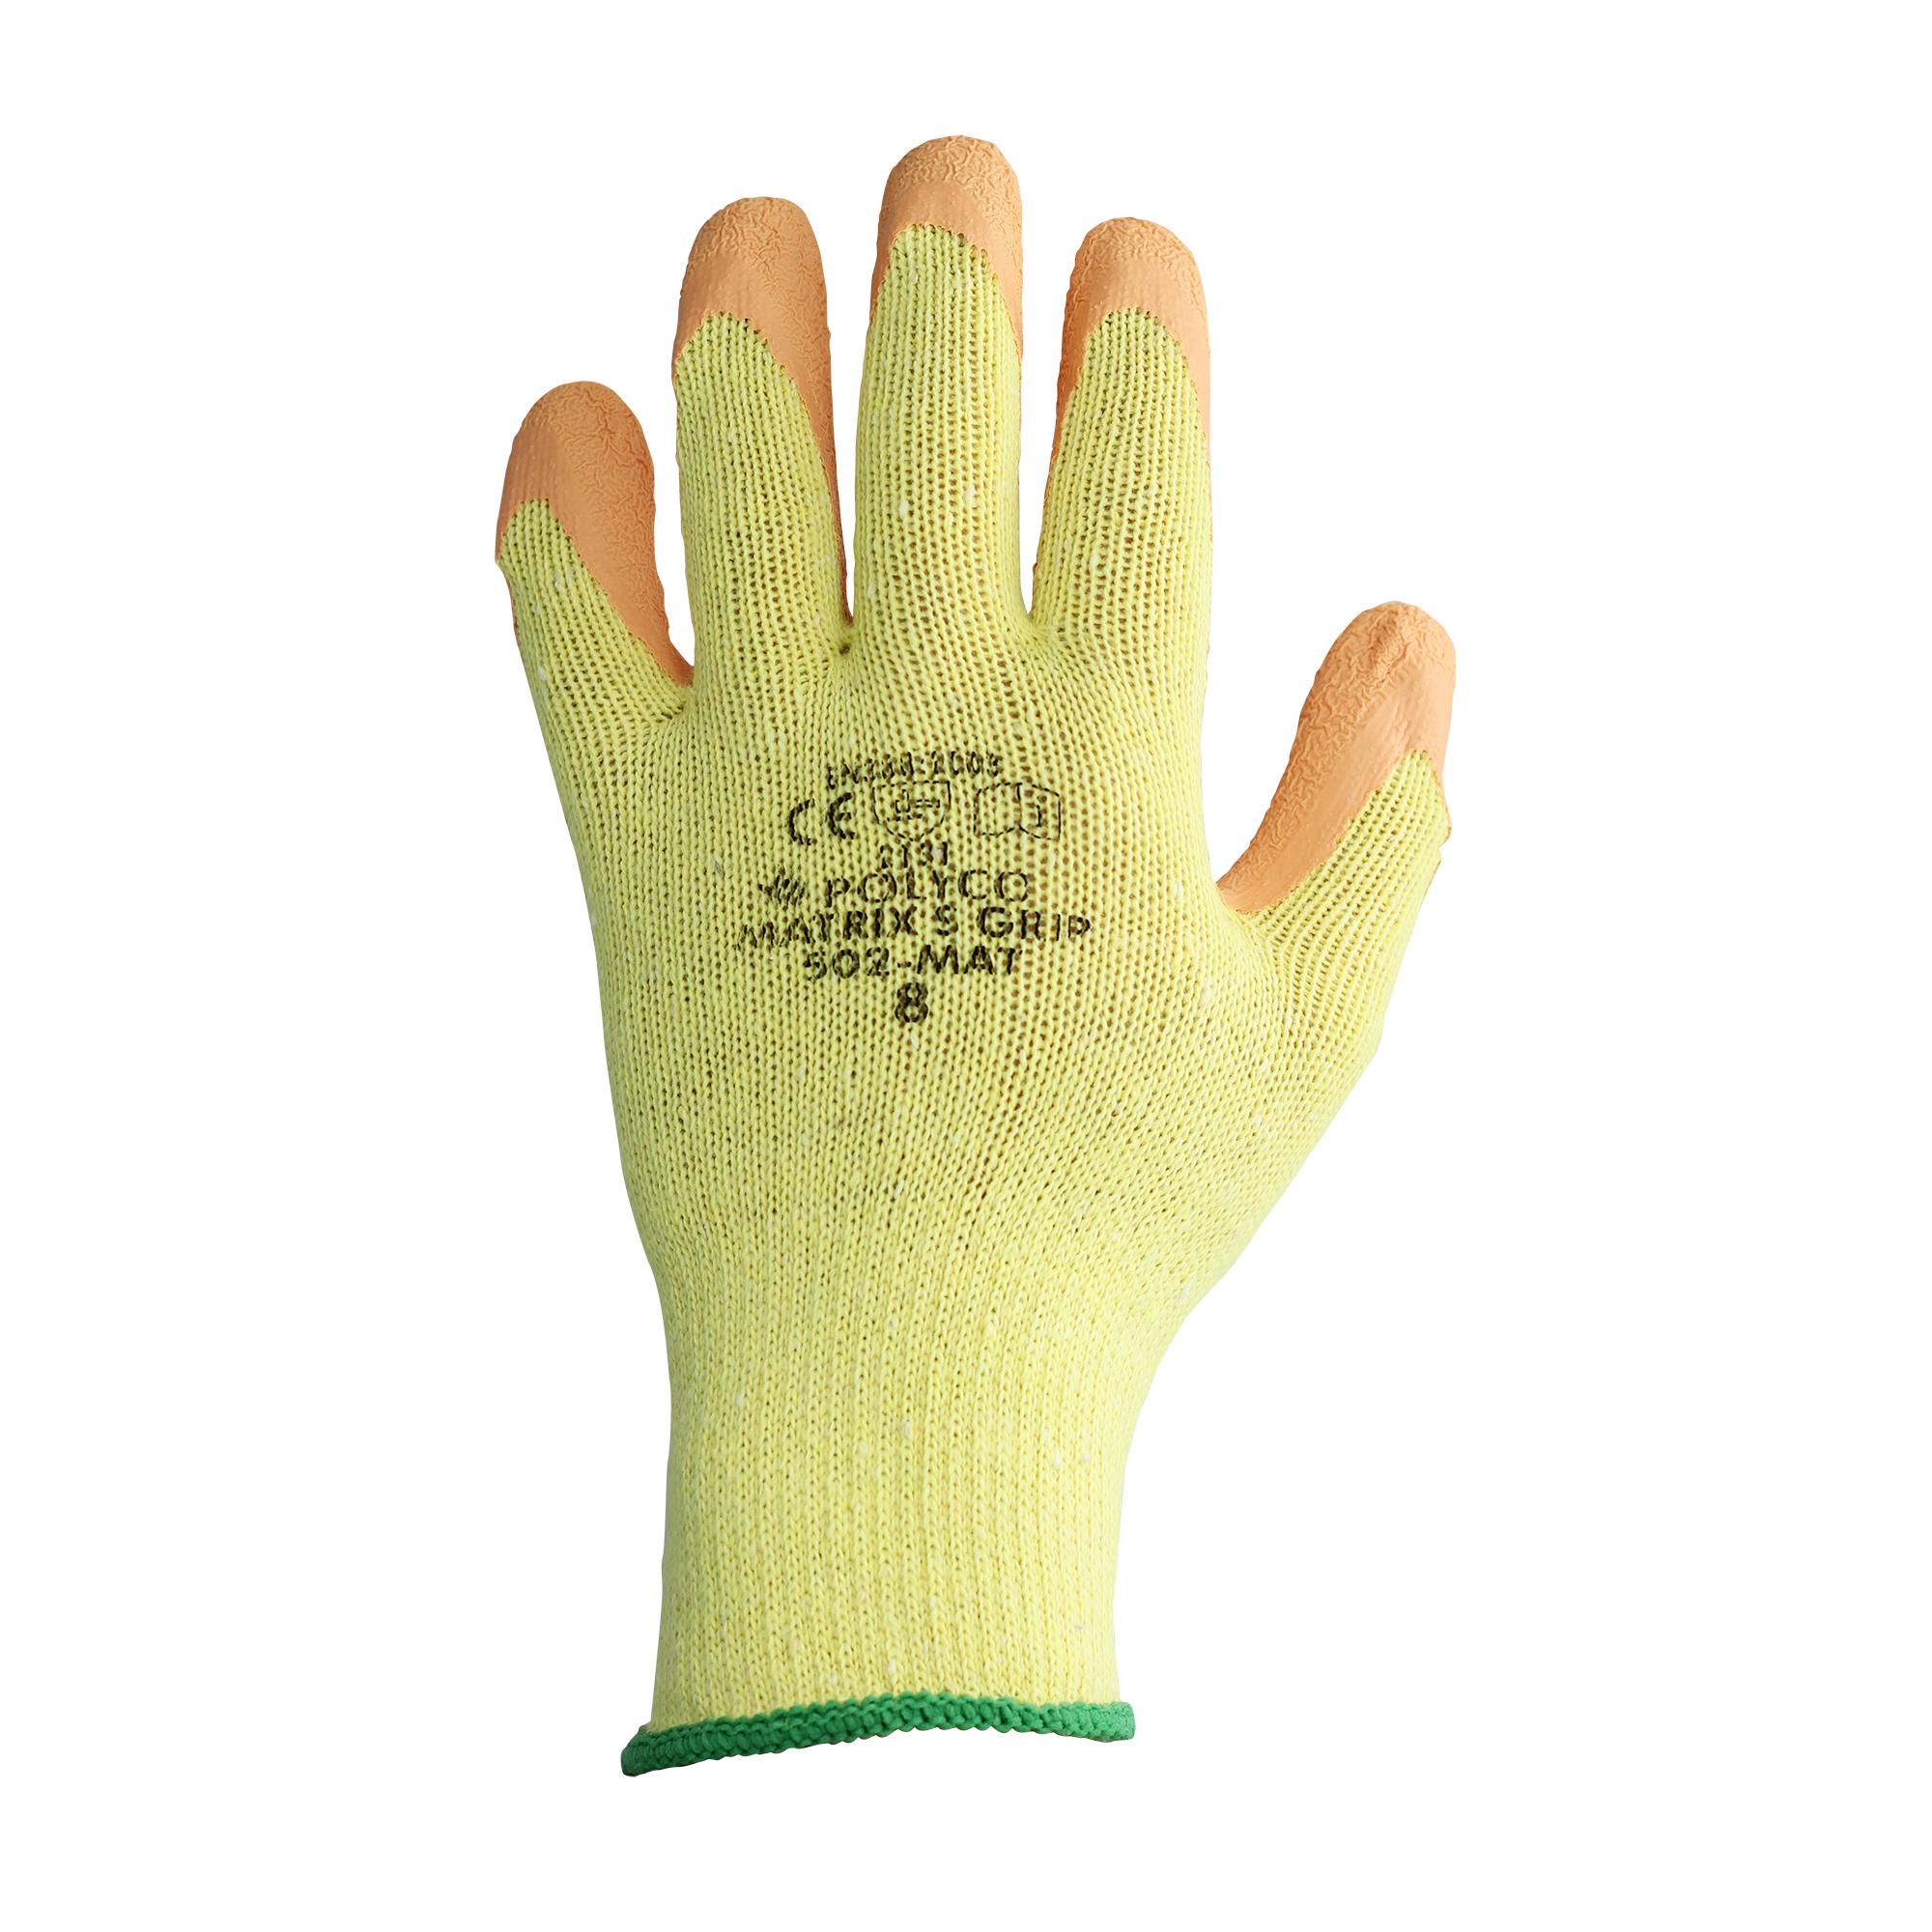 Polyco Orange Matrix S Latex Coated Gripper Gloves